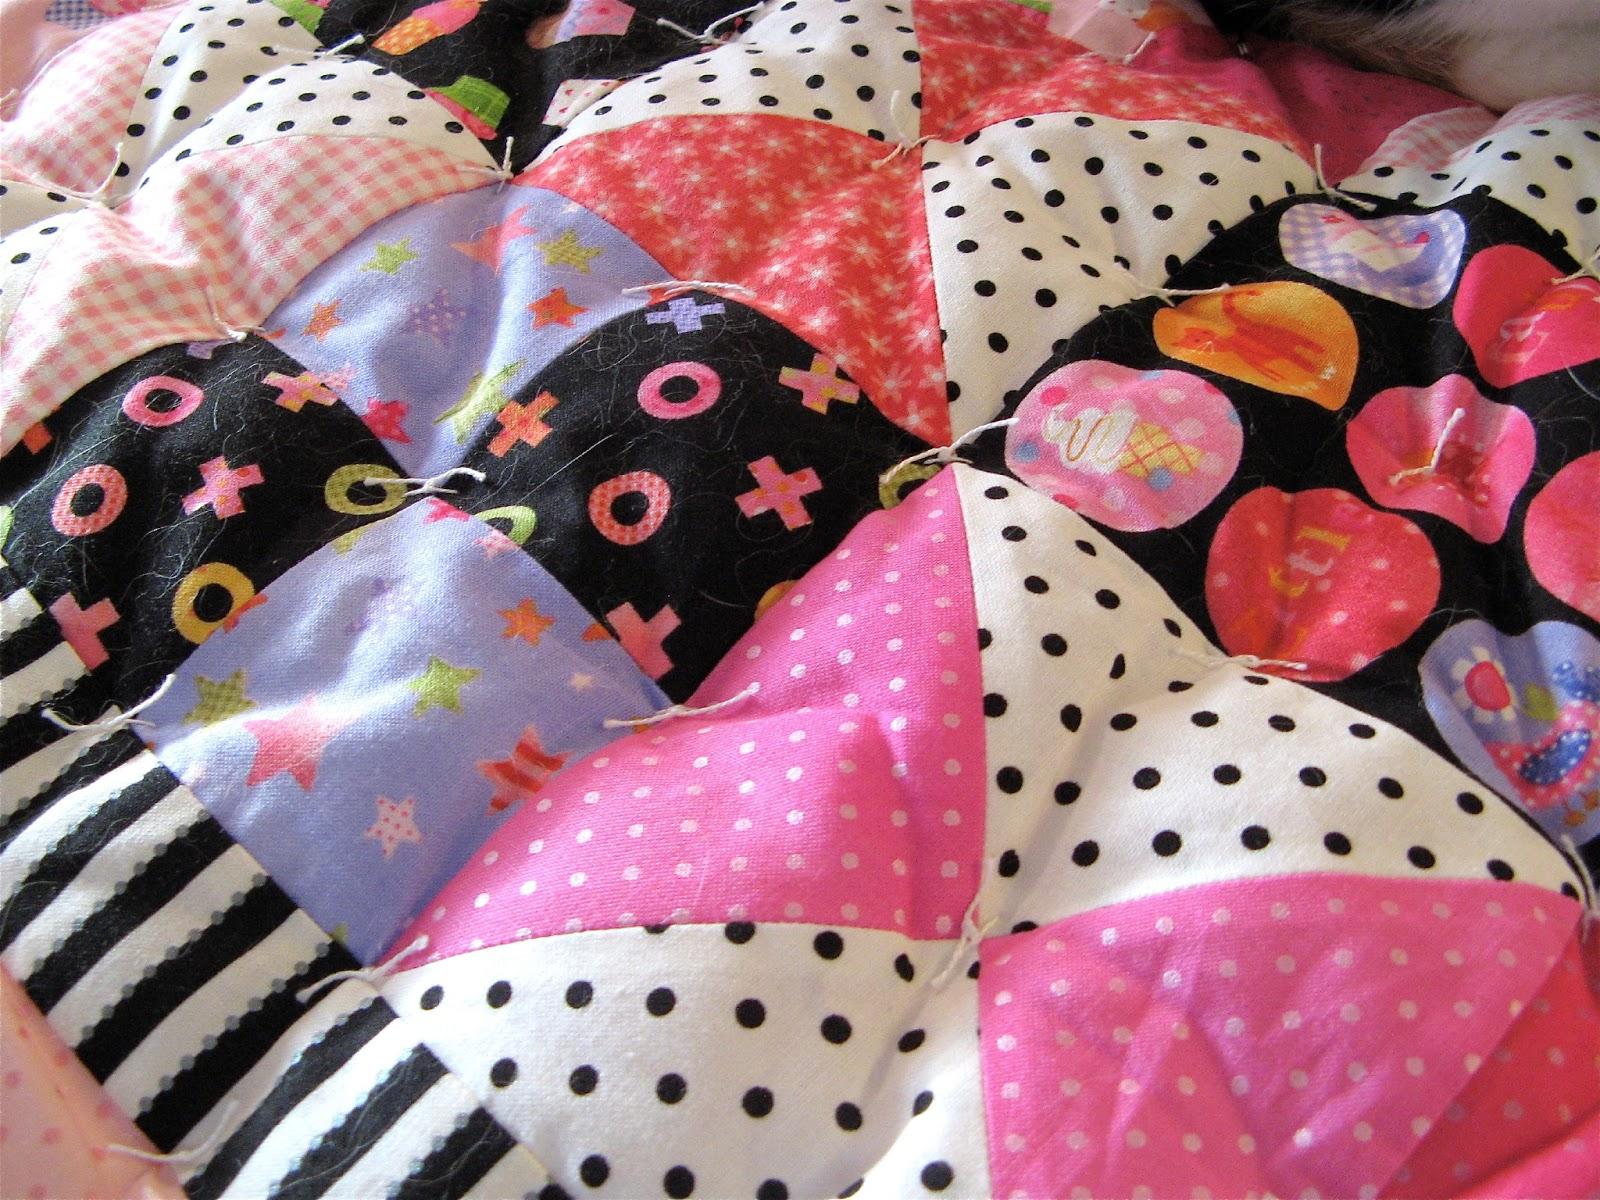 Sew Fabulous Quilt Shop: Tutorial - How To Hand Tie A Quilt : hand tying a quilt - Adamdwight.com